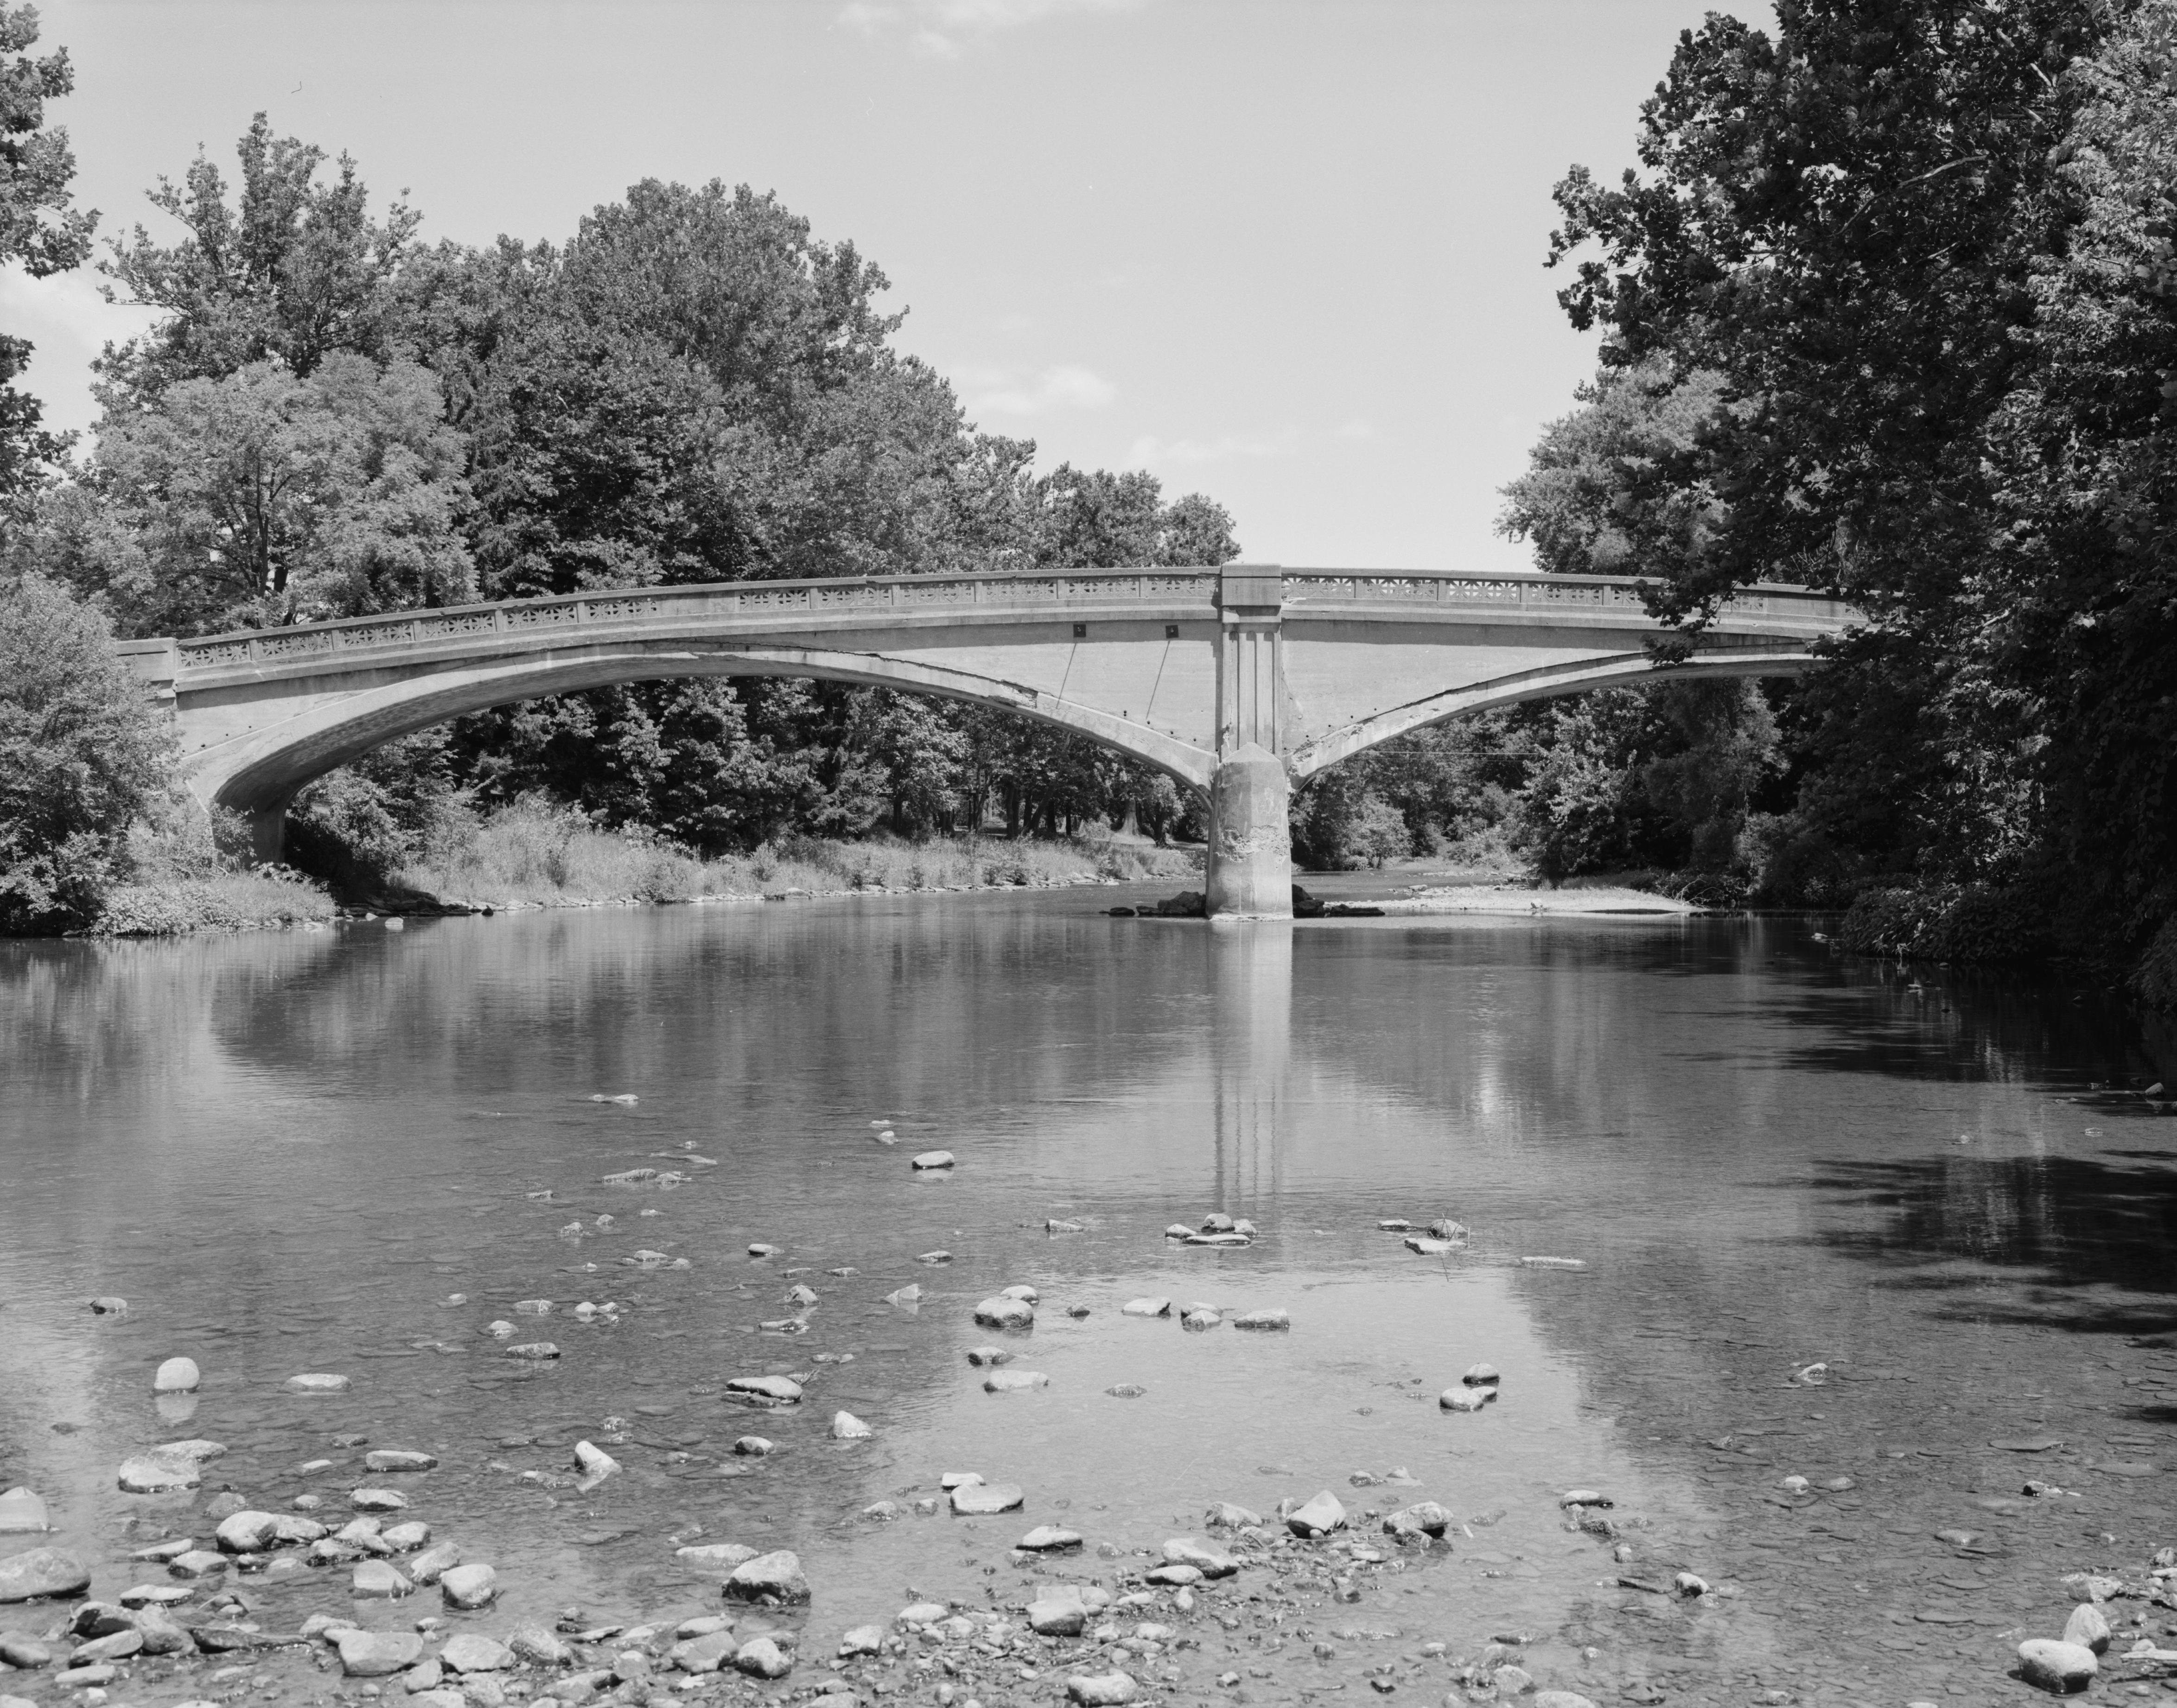 Camelback Bridge over Penns Creek between Monroe Twp and Penn Twp.